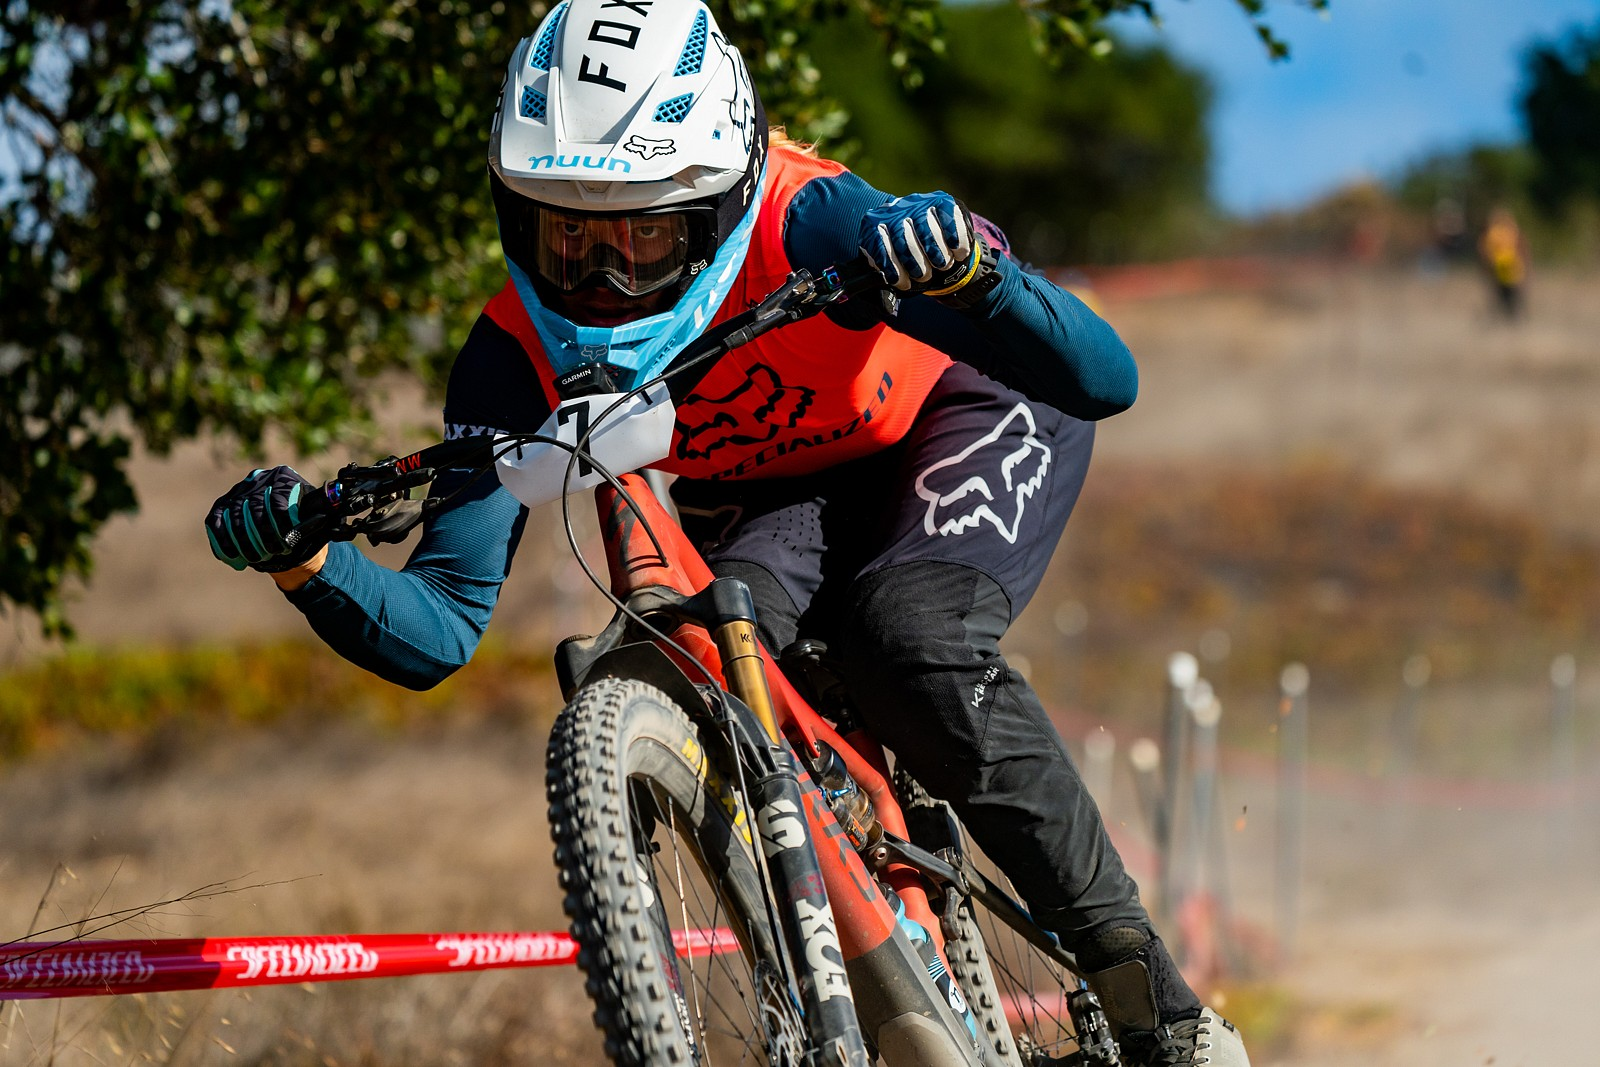 Cody Kelley - Zuestman - Mountain Biking Pictures - Vital MTB